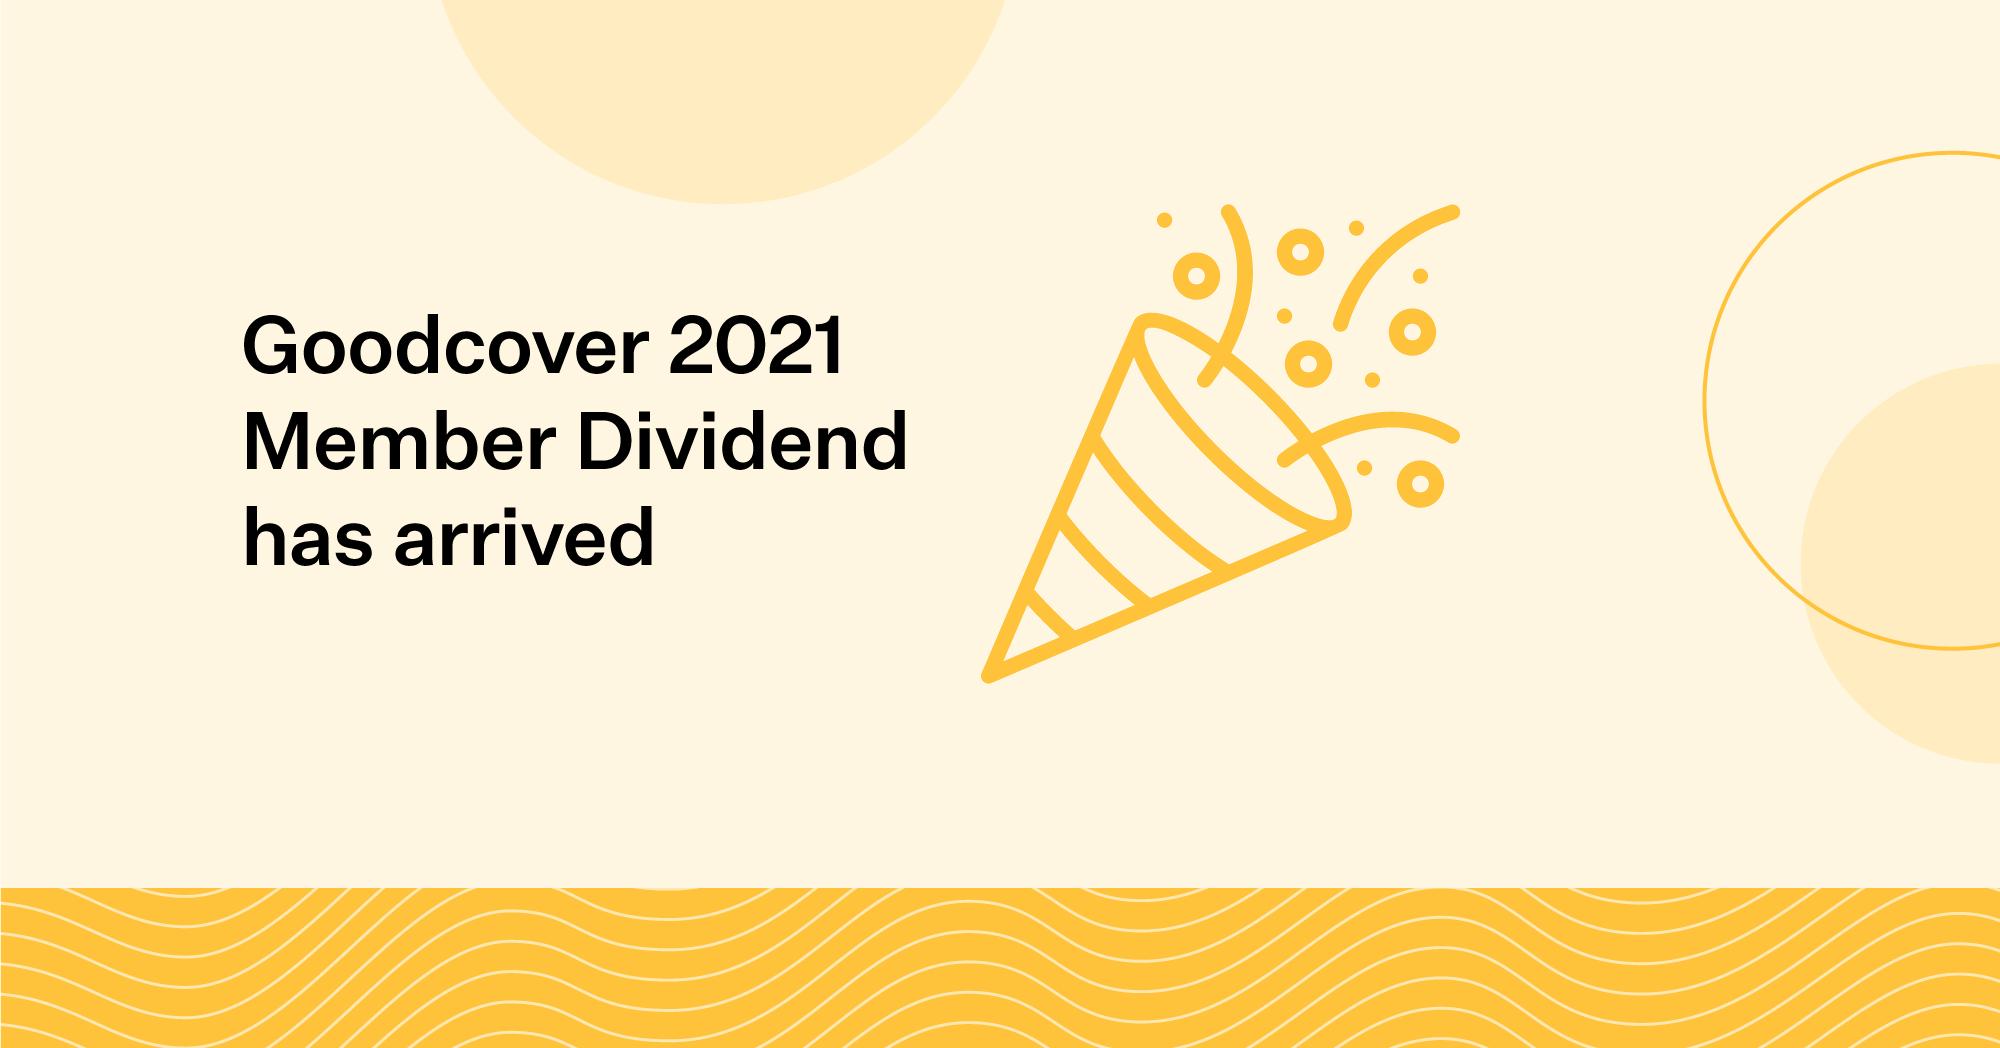 Goodcover Member Dividend 2021